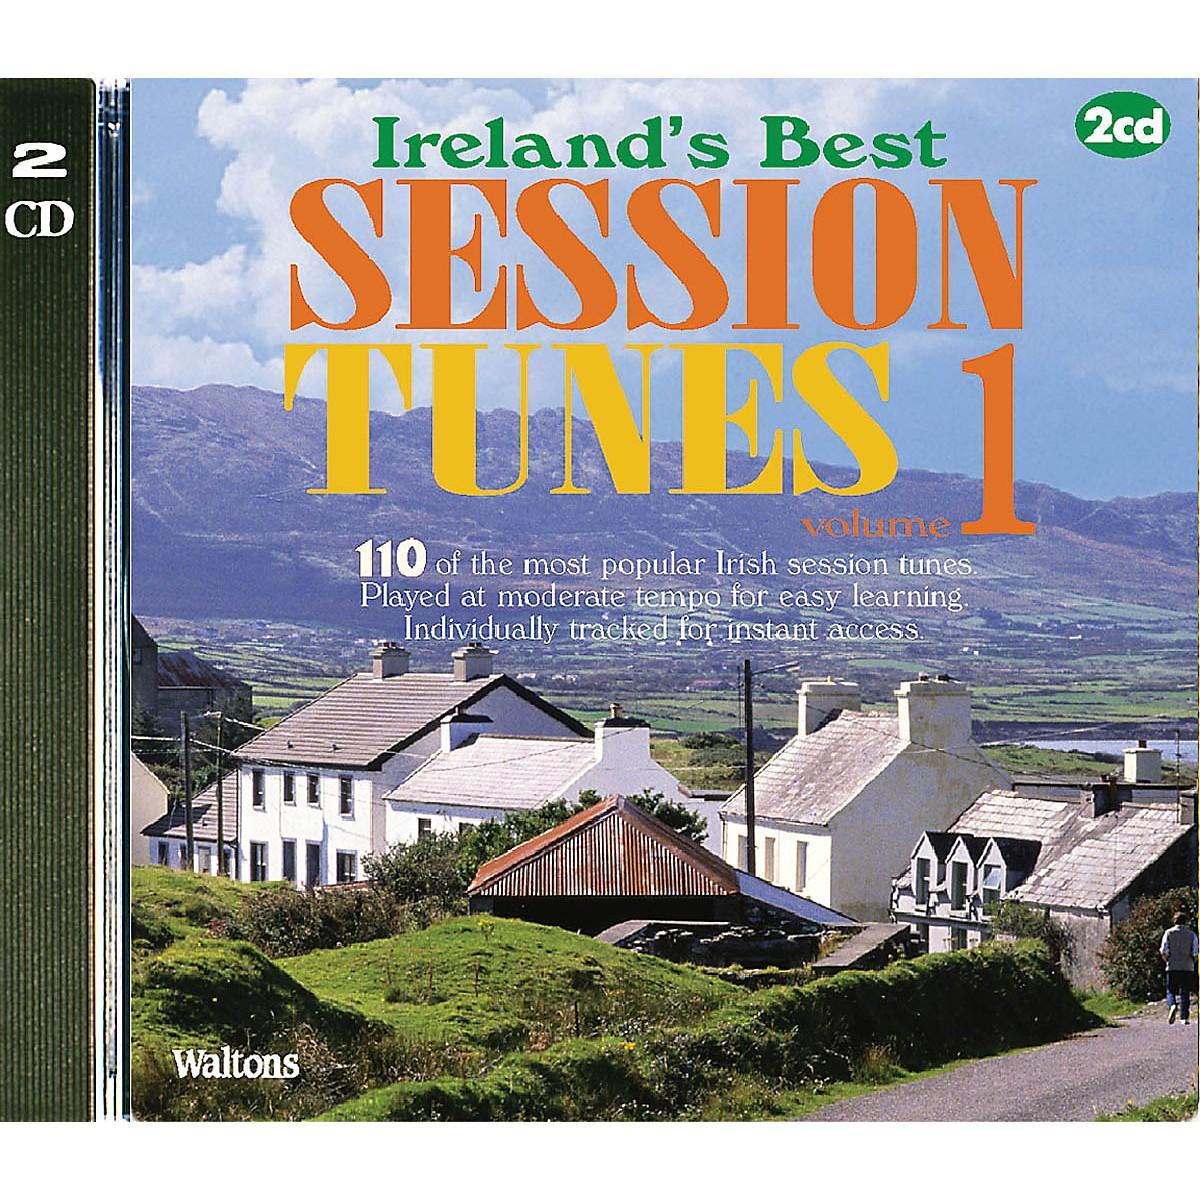 Waltons 110 Ireland's Best Session Tunes - Volume 1 (with Guitar Chords) Waltons Irish Music Books Series CD